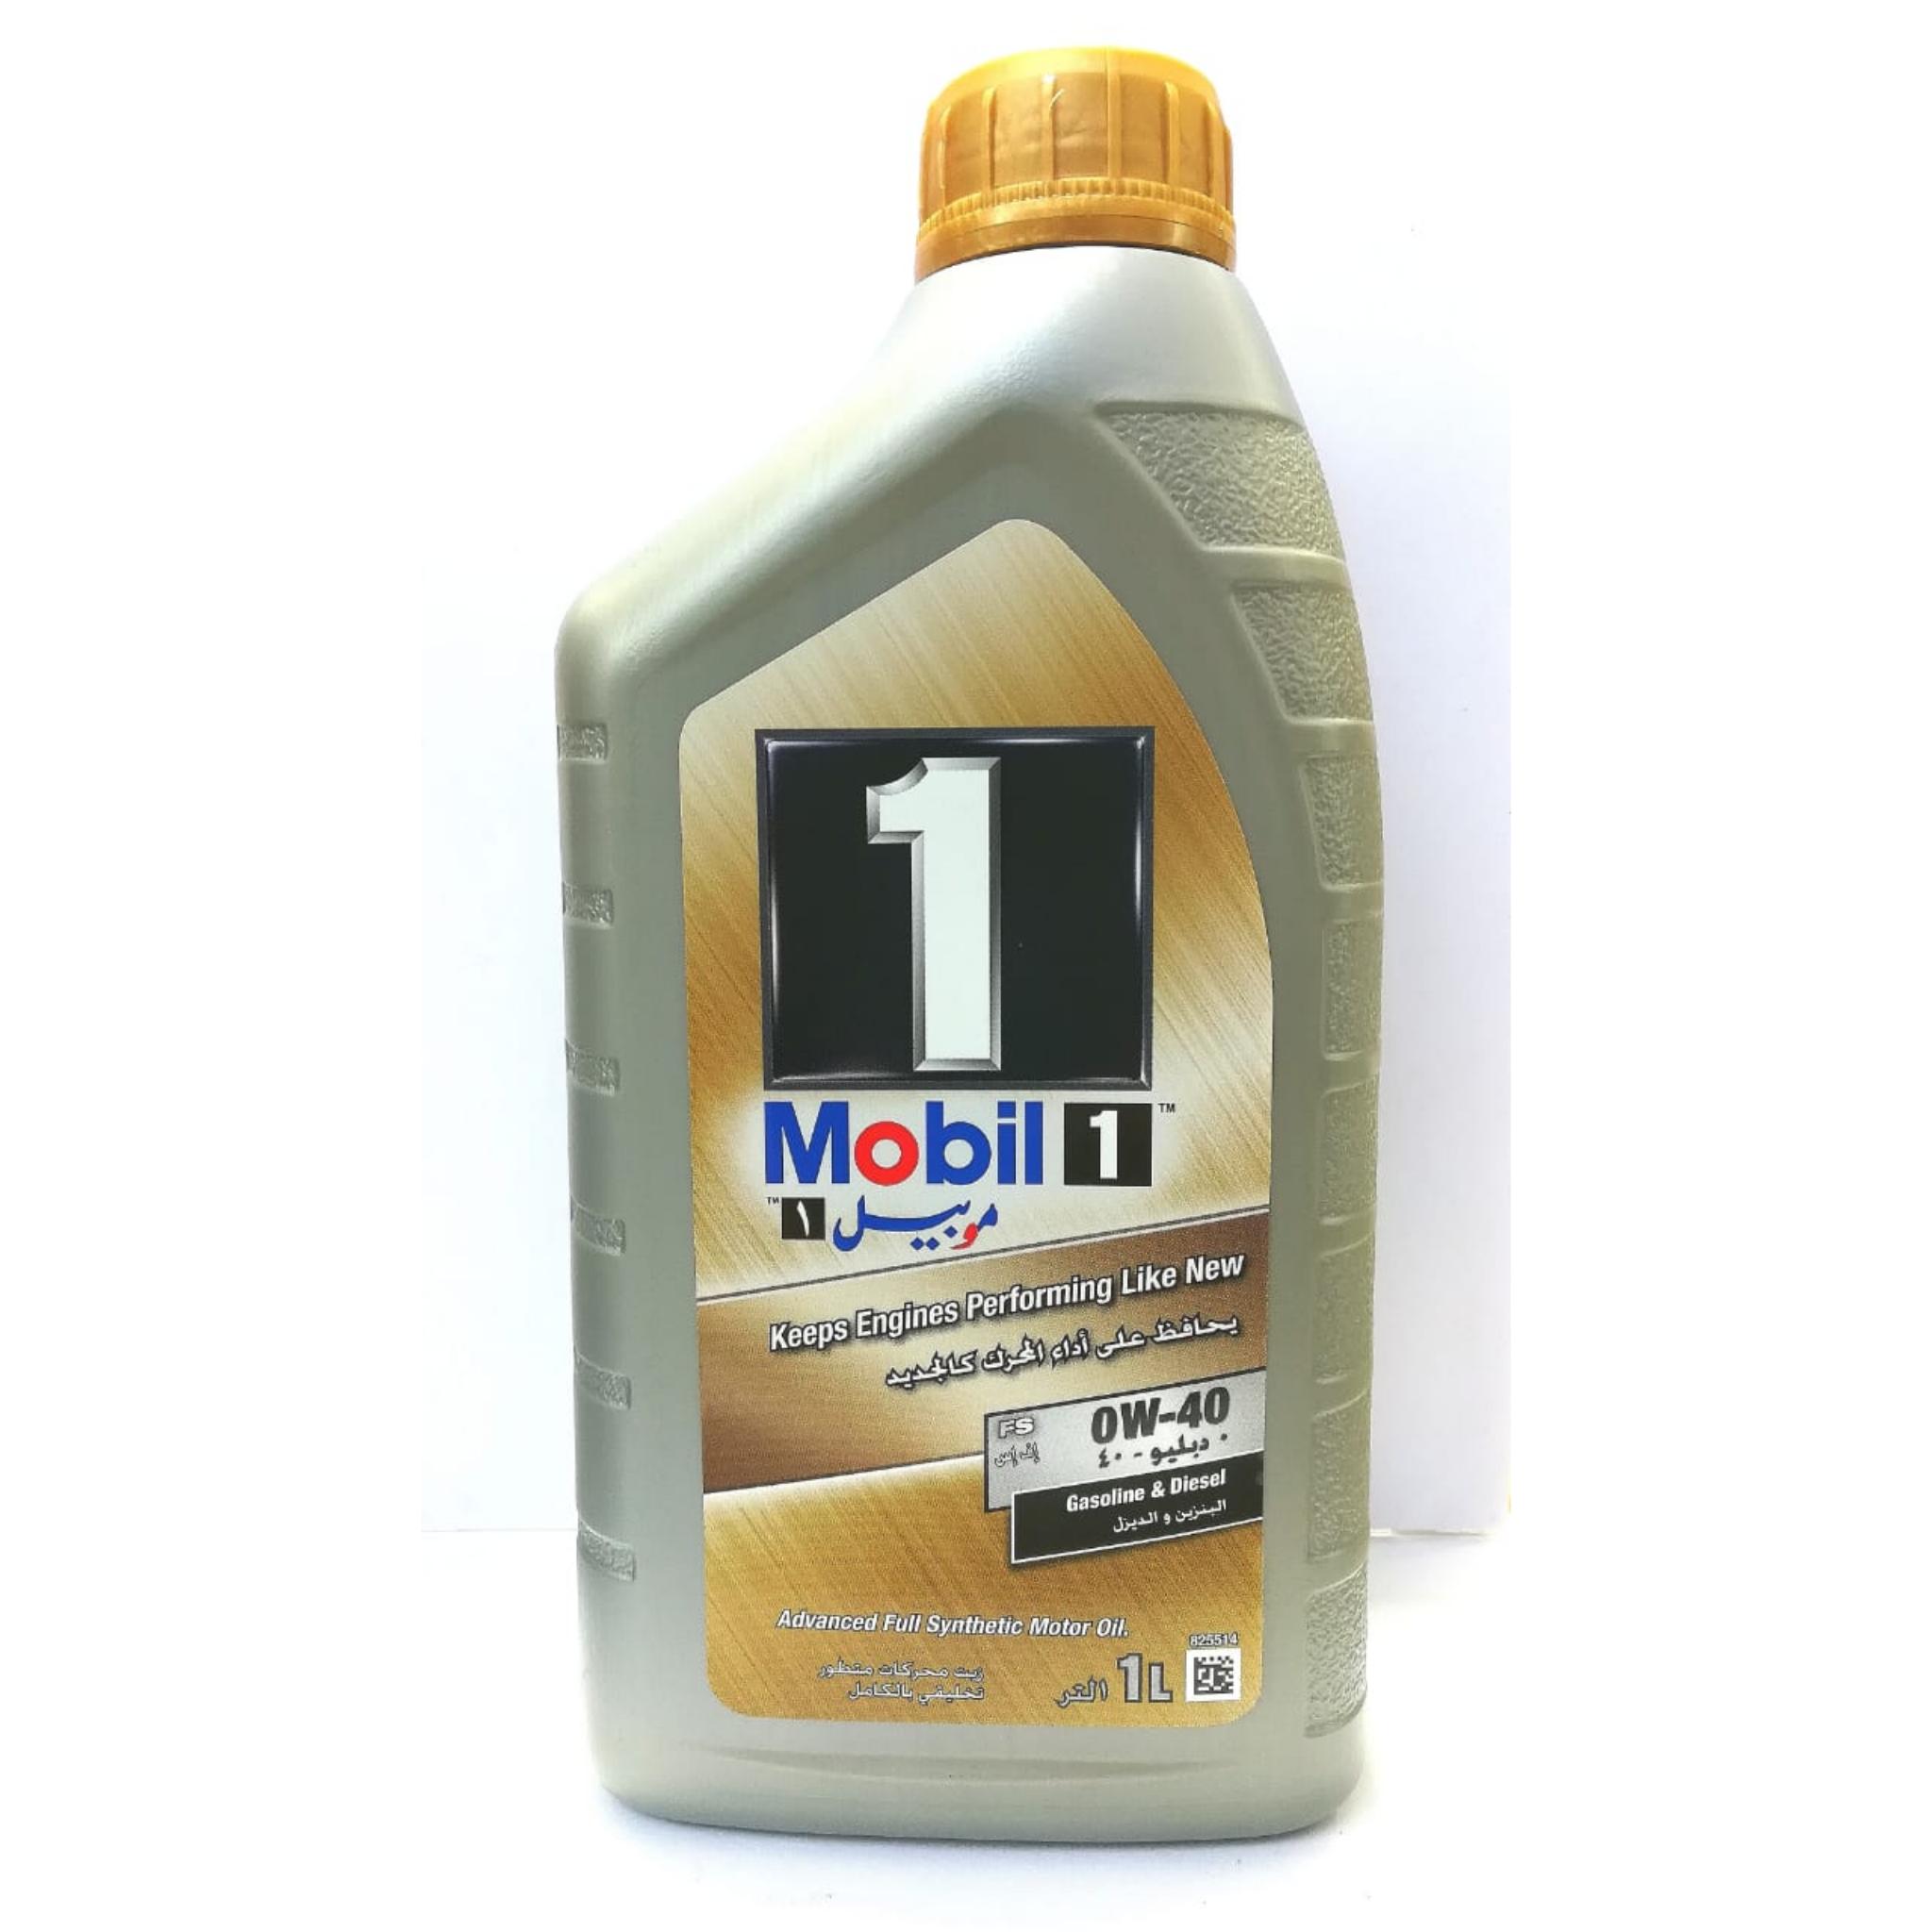 Mobil 1 Engine Oil 0w40 1ltr متجر المحركات